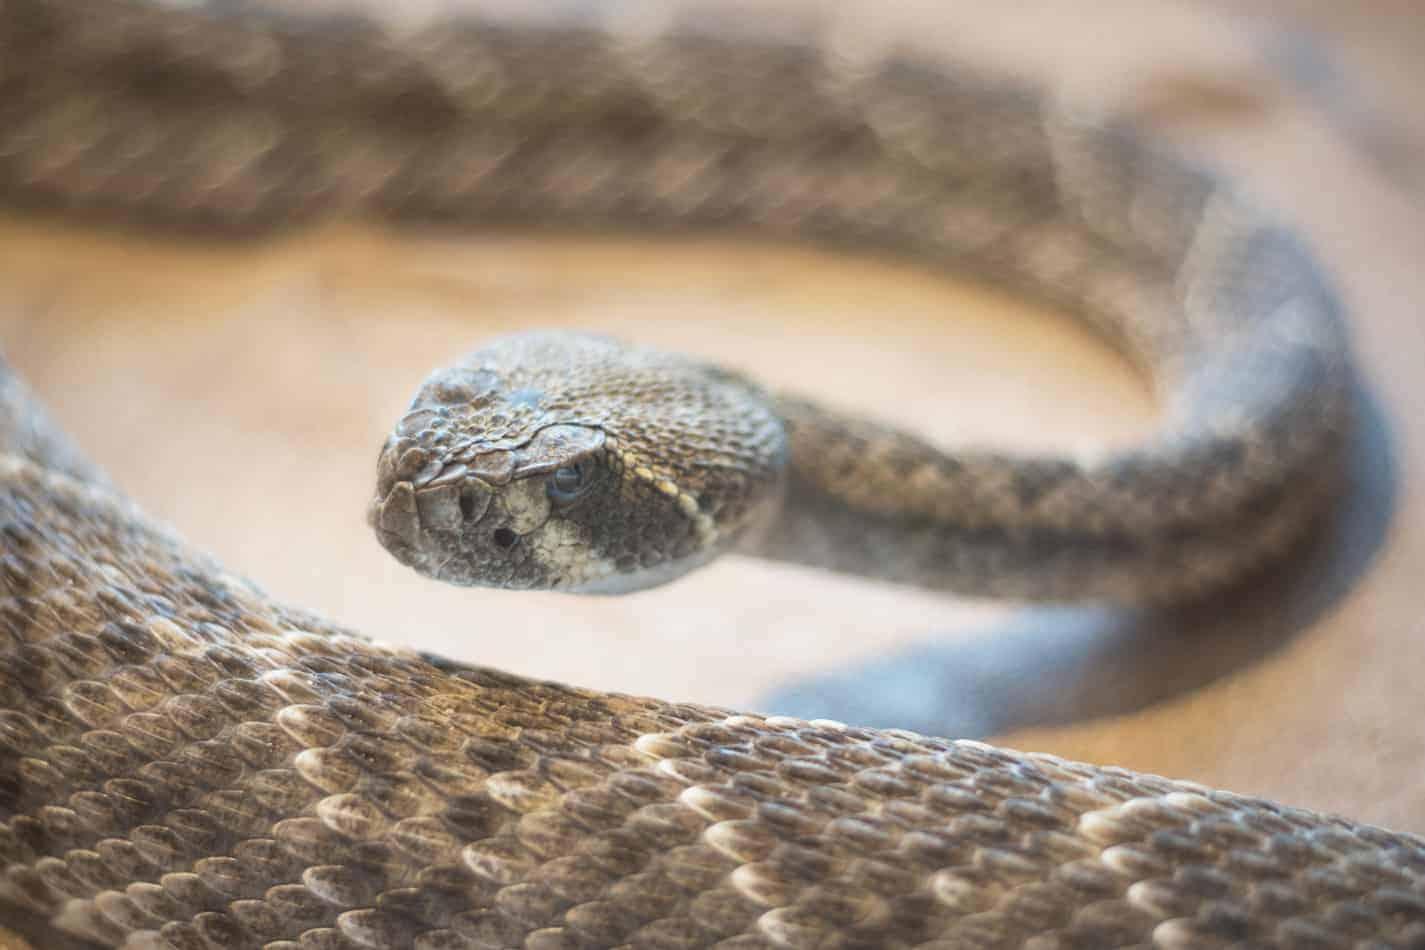 Can a Rattlesnake Kill a Dog?